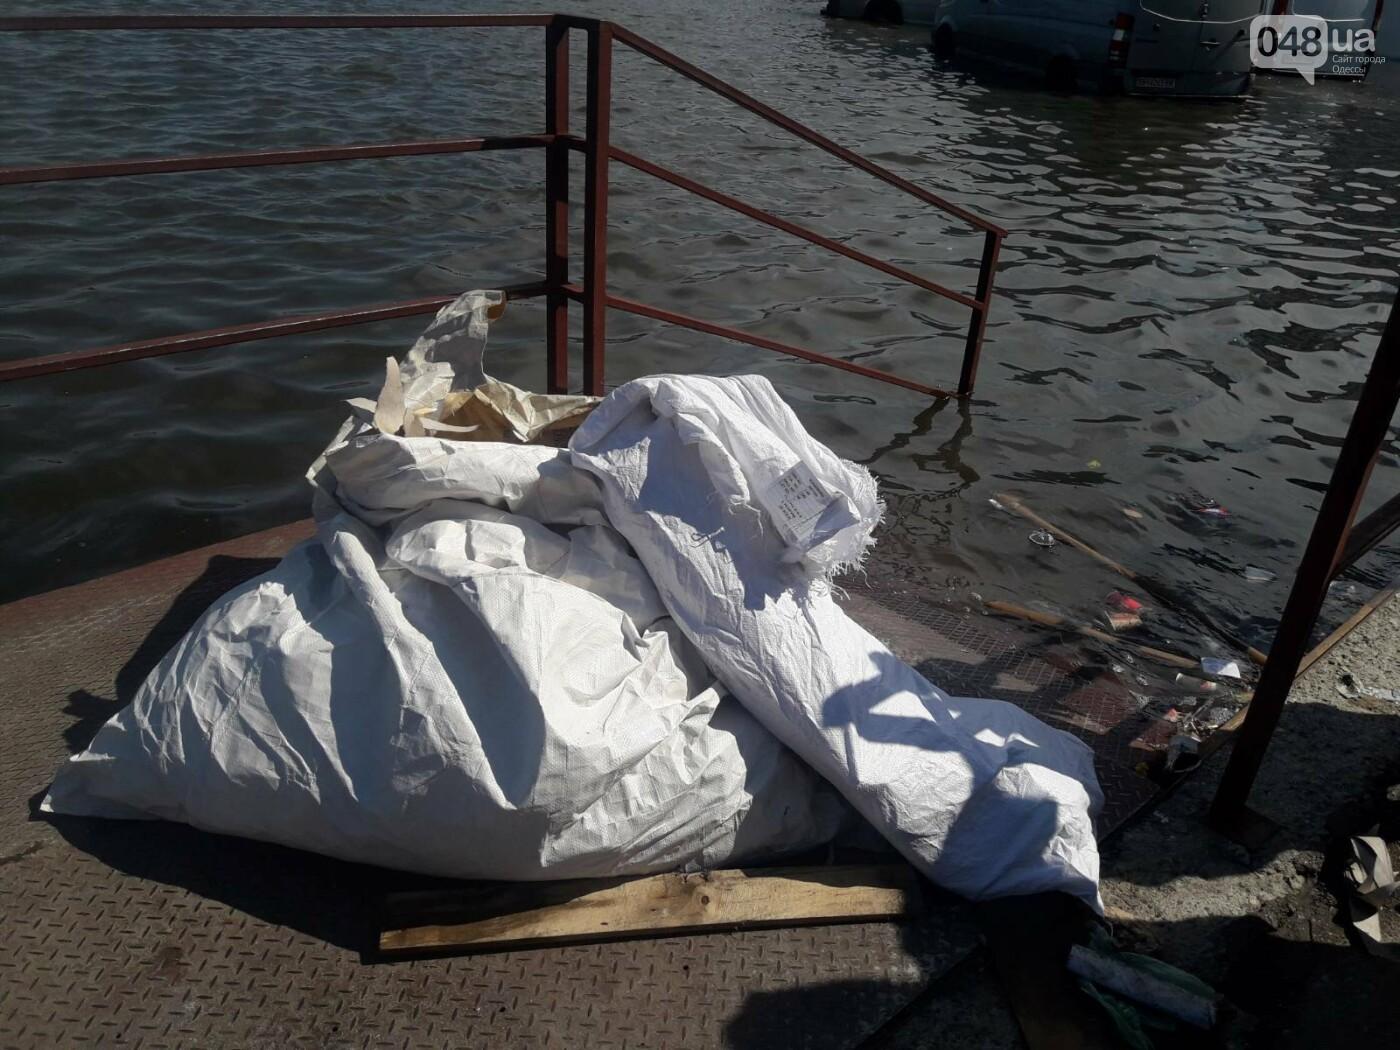 На промрынке 7км в Одессе образовалось море, - ФОТО, фото-7